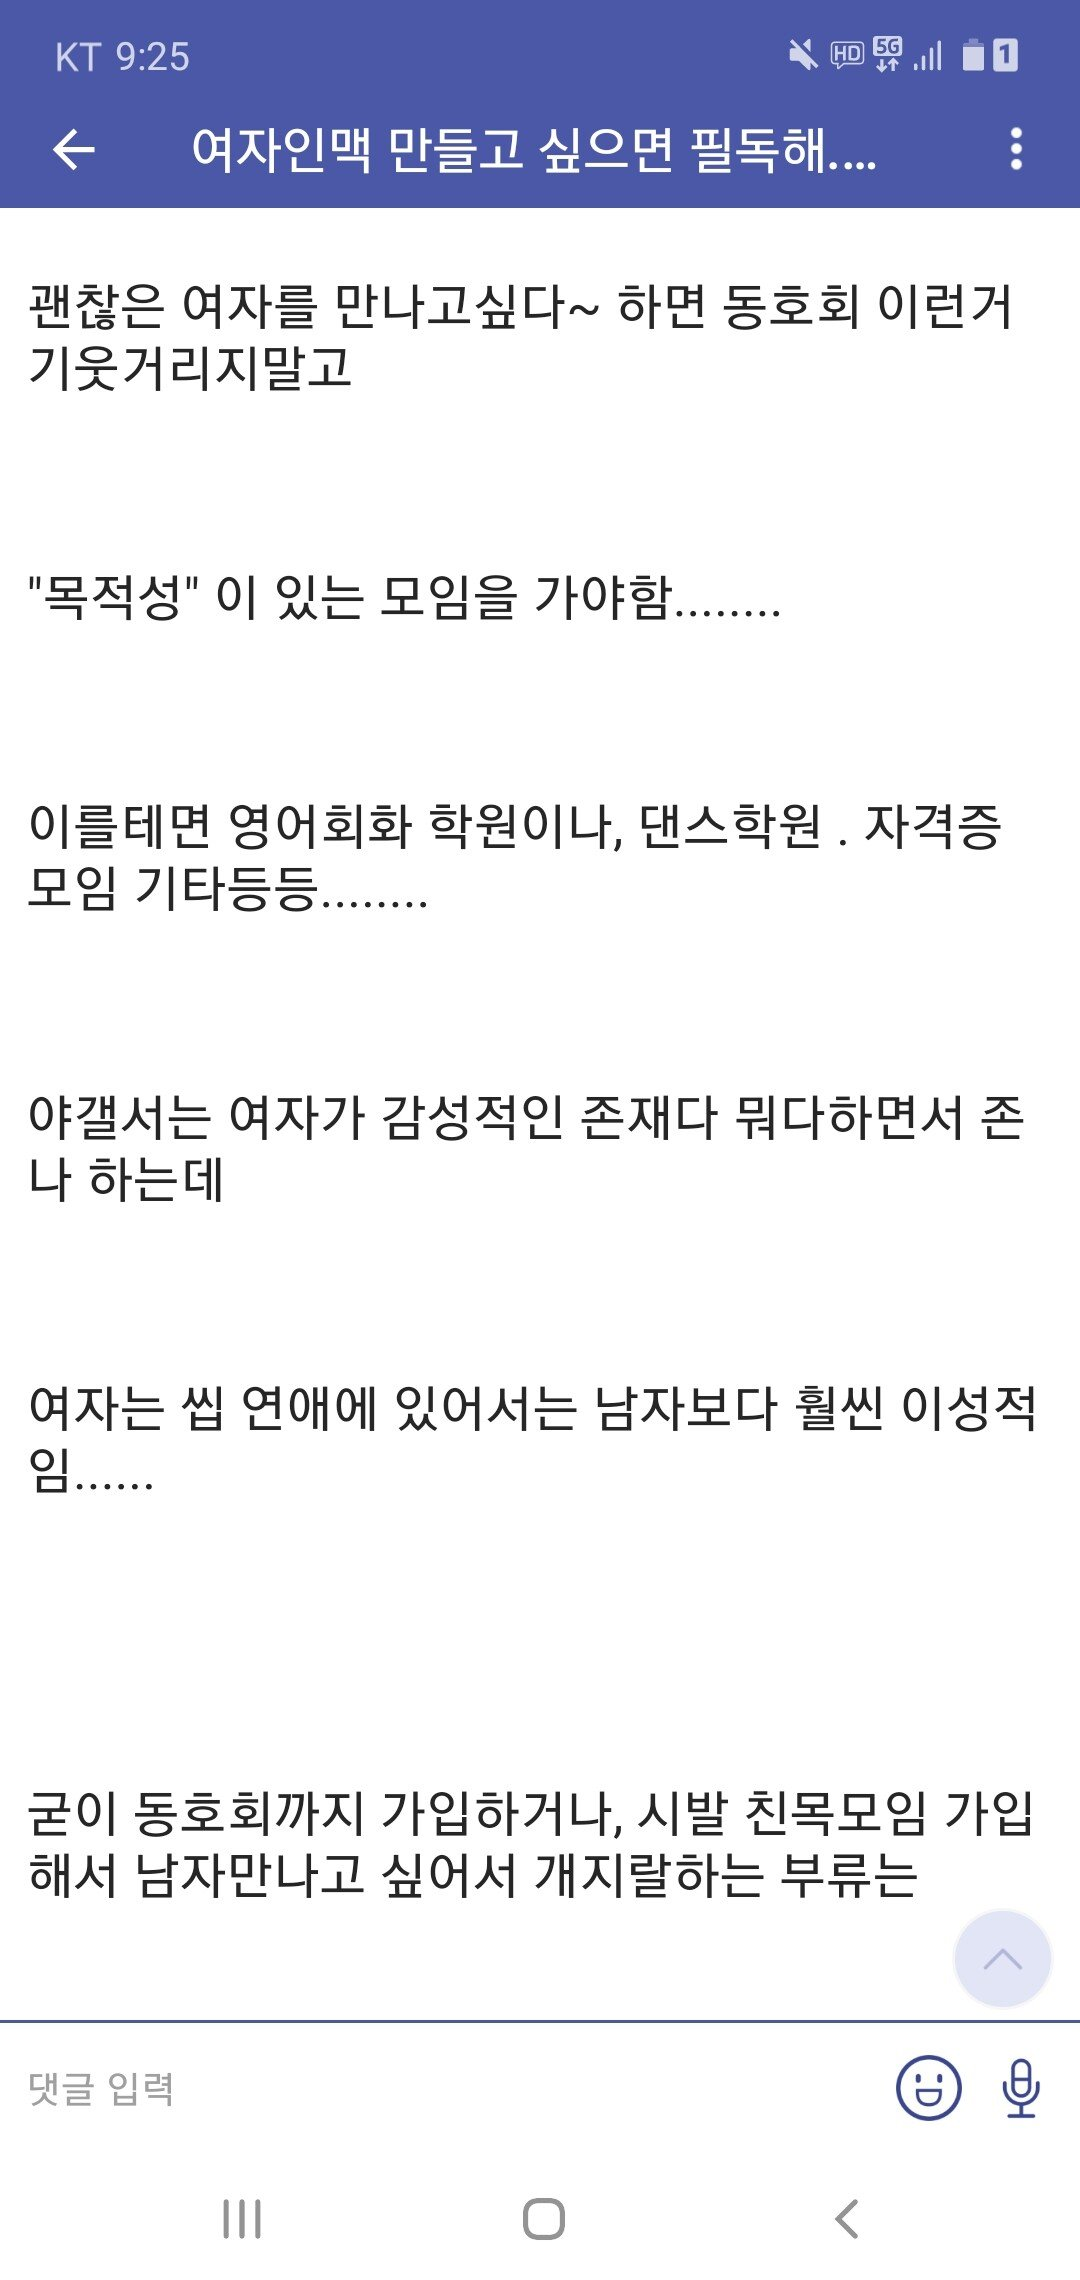 Screenshot_20201030-092535.jpg 야갤러가 말하는 여자인맥 만드는 법.jpg